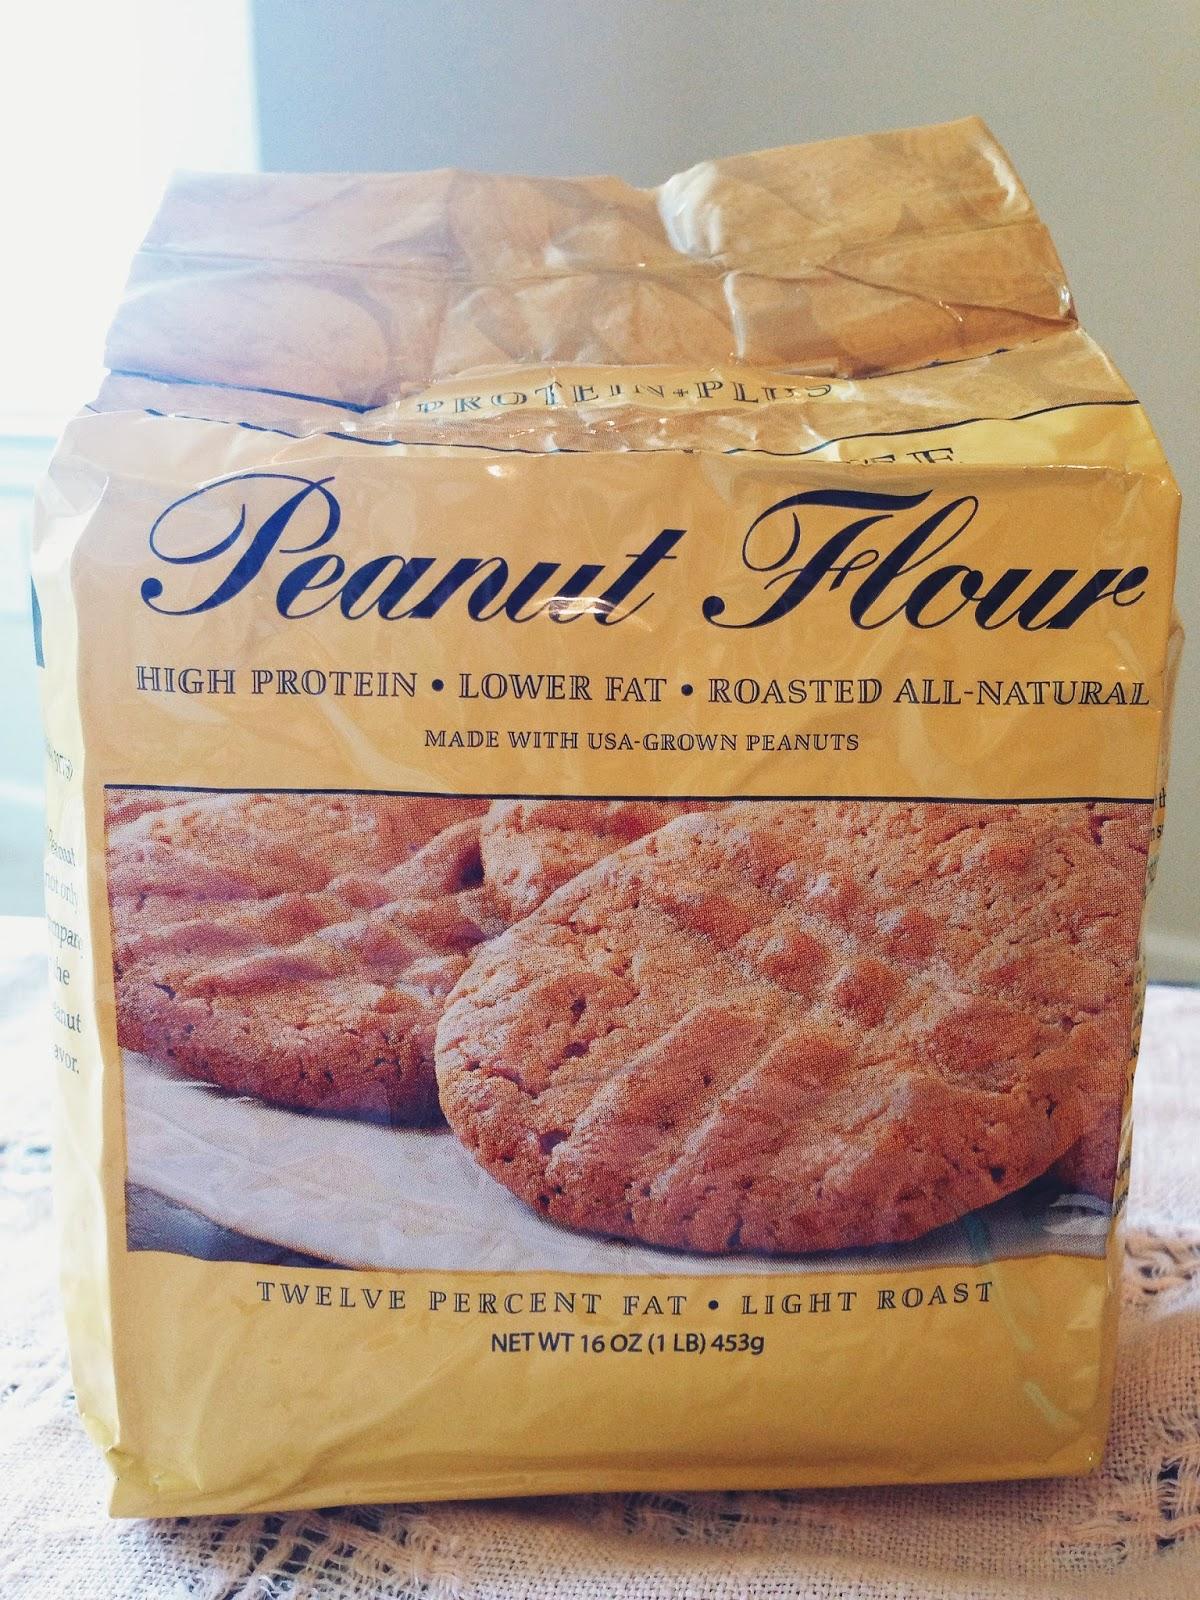 Where to buy peanut flour